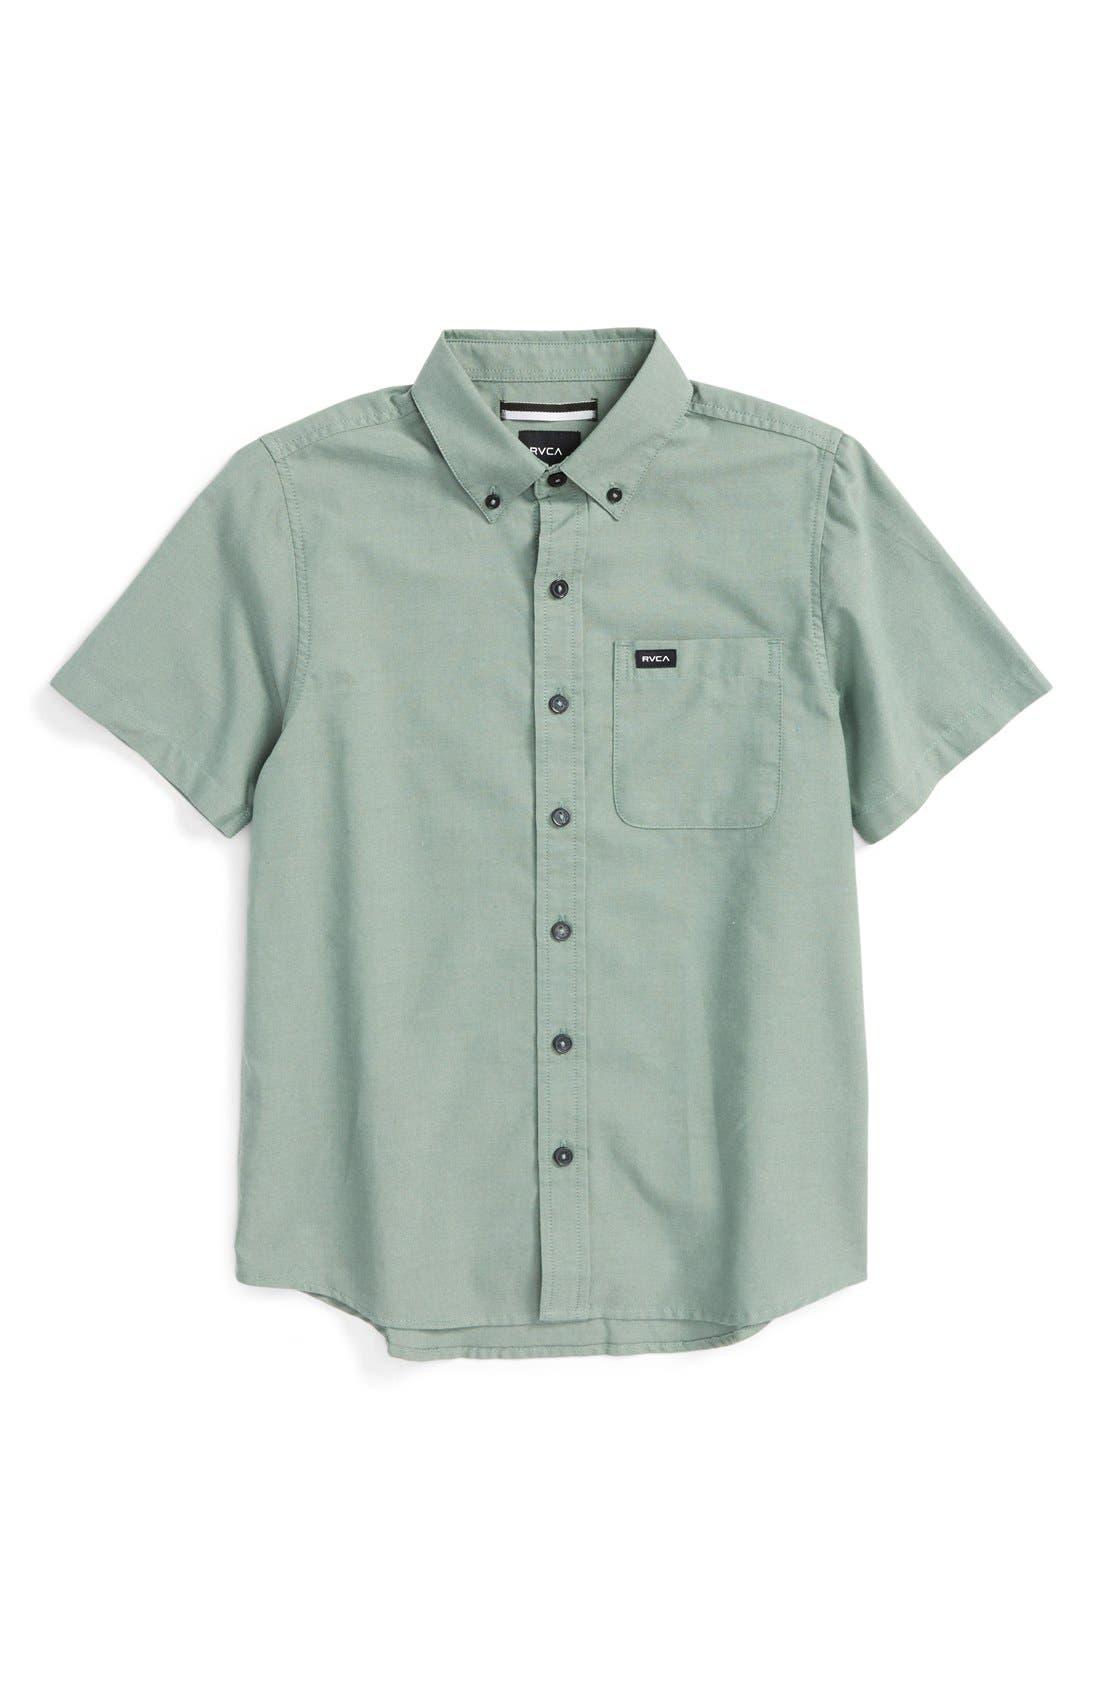 'That'll Do' Woven Shirt,                             Main thumbnail 11, color,